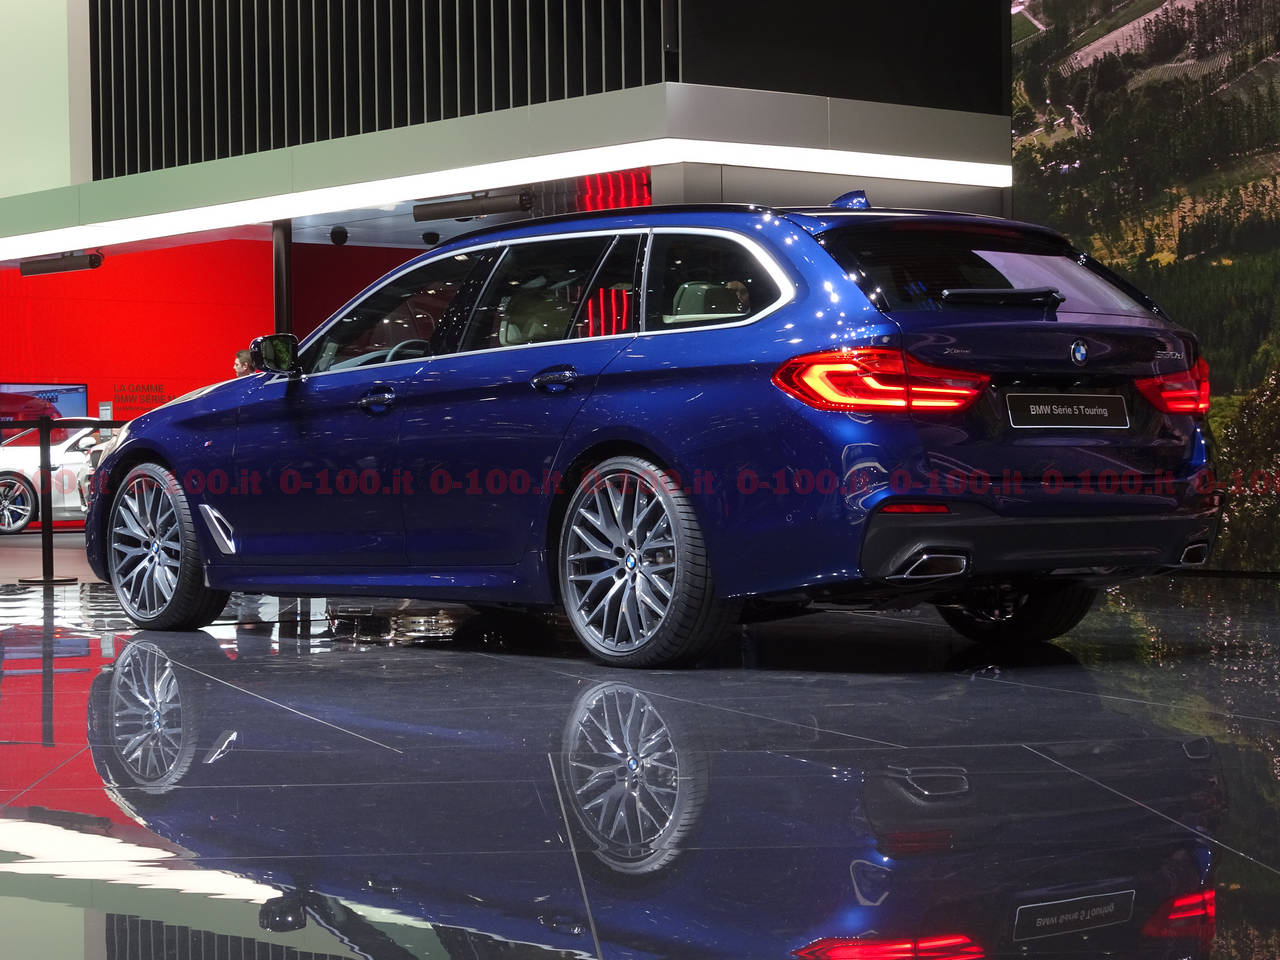 Ginevra-geneva-geneve-2017-BMW_Serie-5-Touring_0-100_17